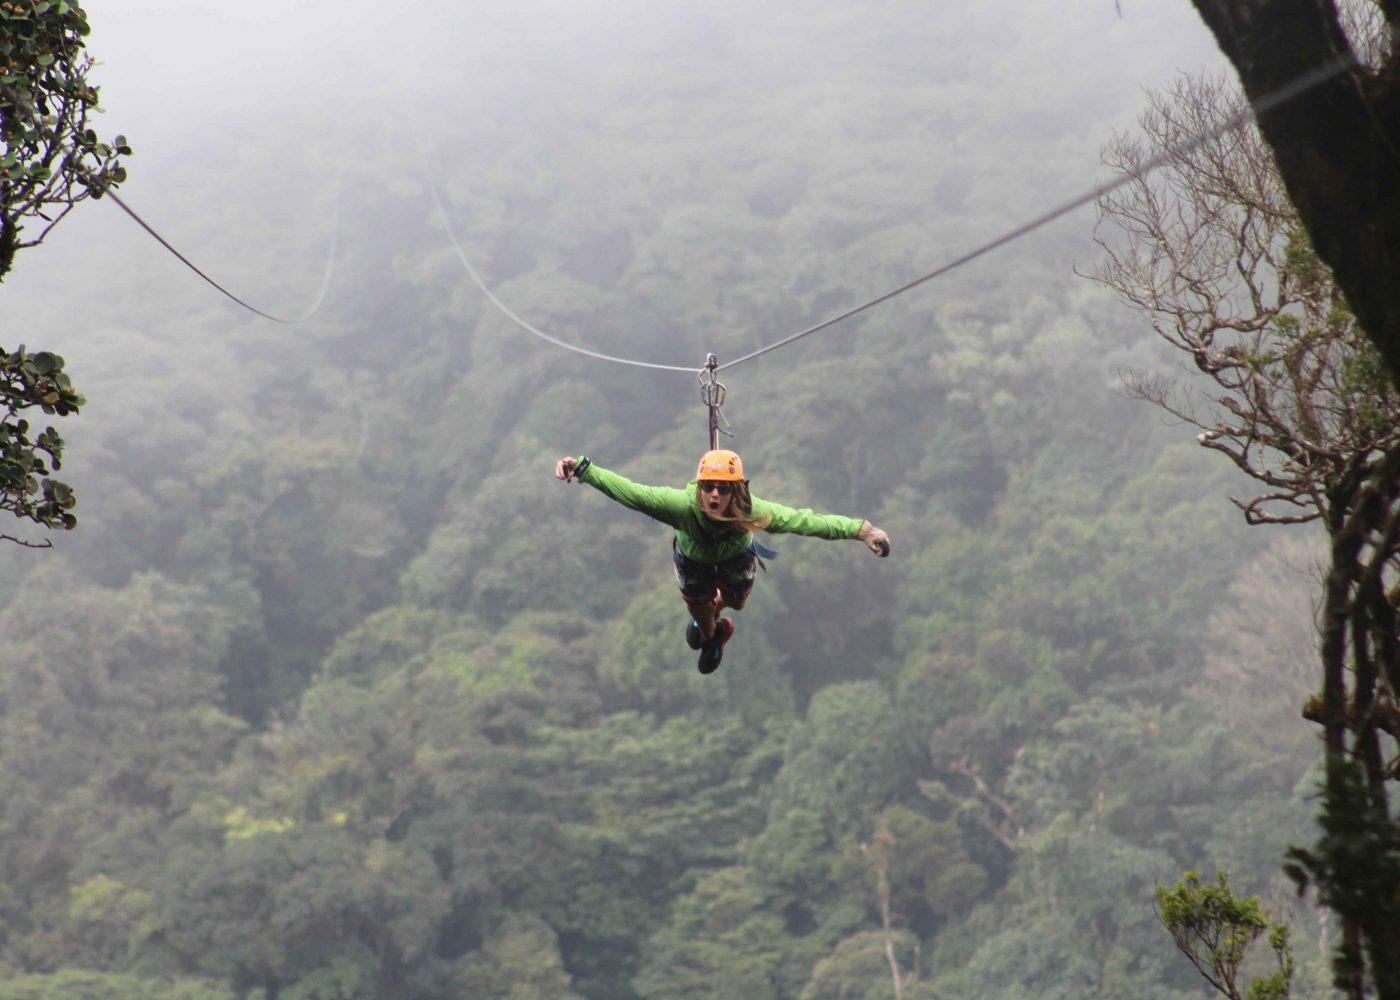 Superman zip line at 100% Aventura Canopy Tour in Monteverde, Costa Rica